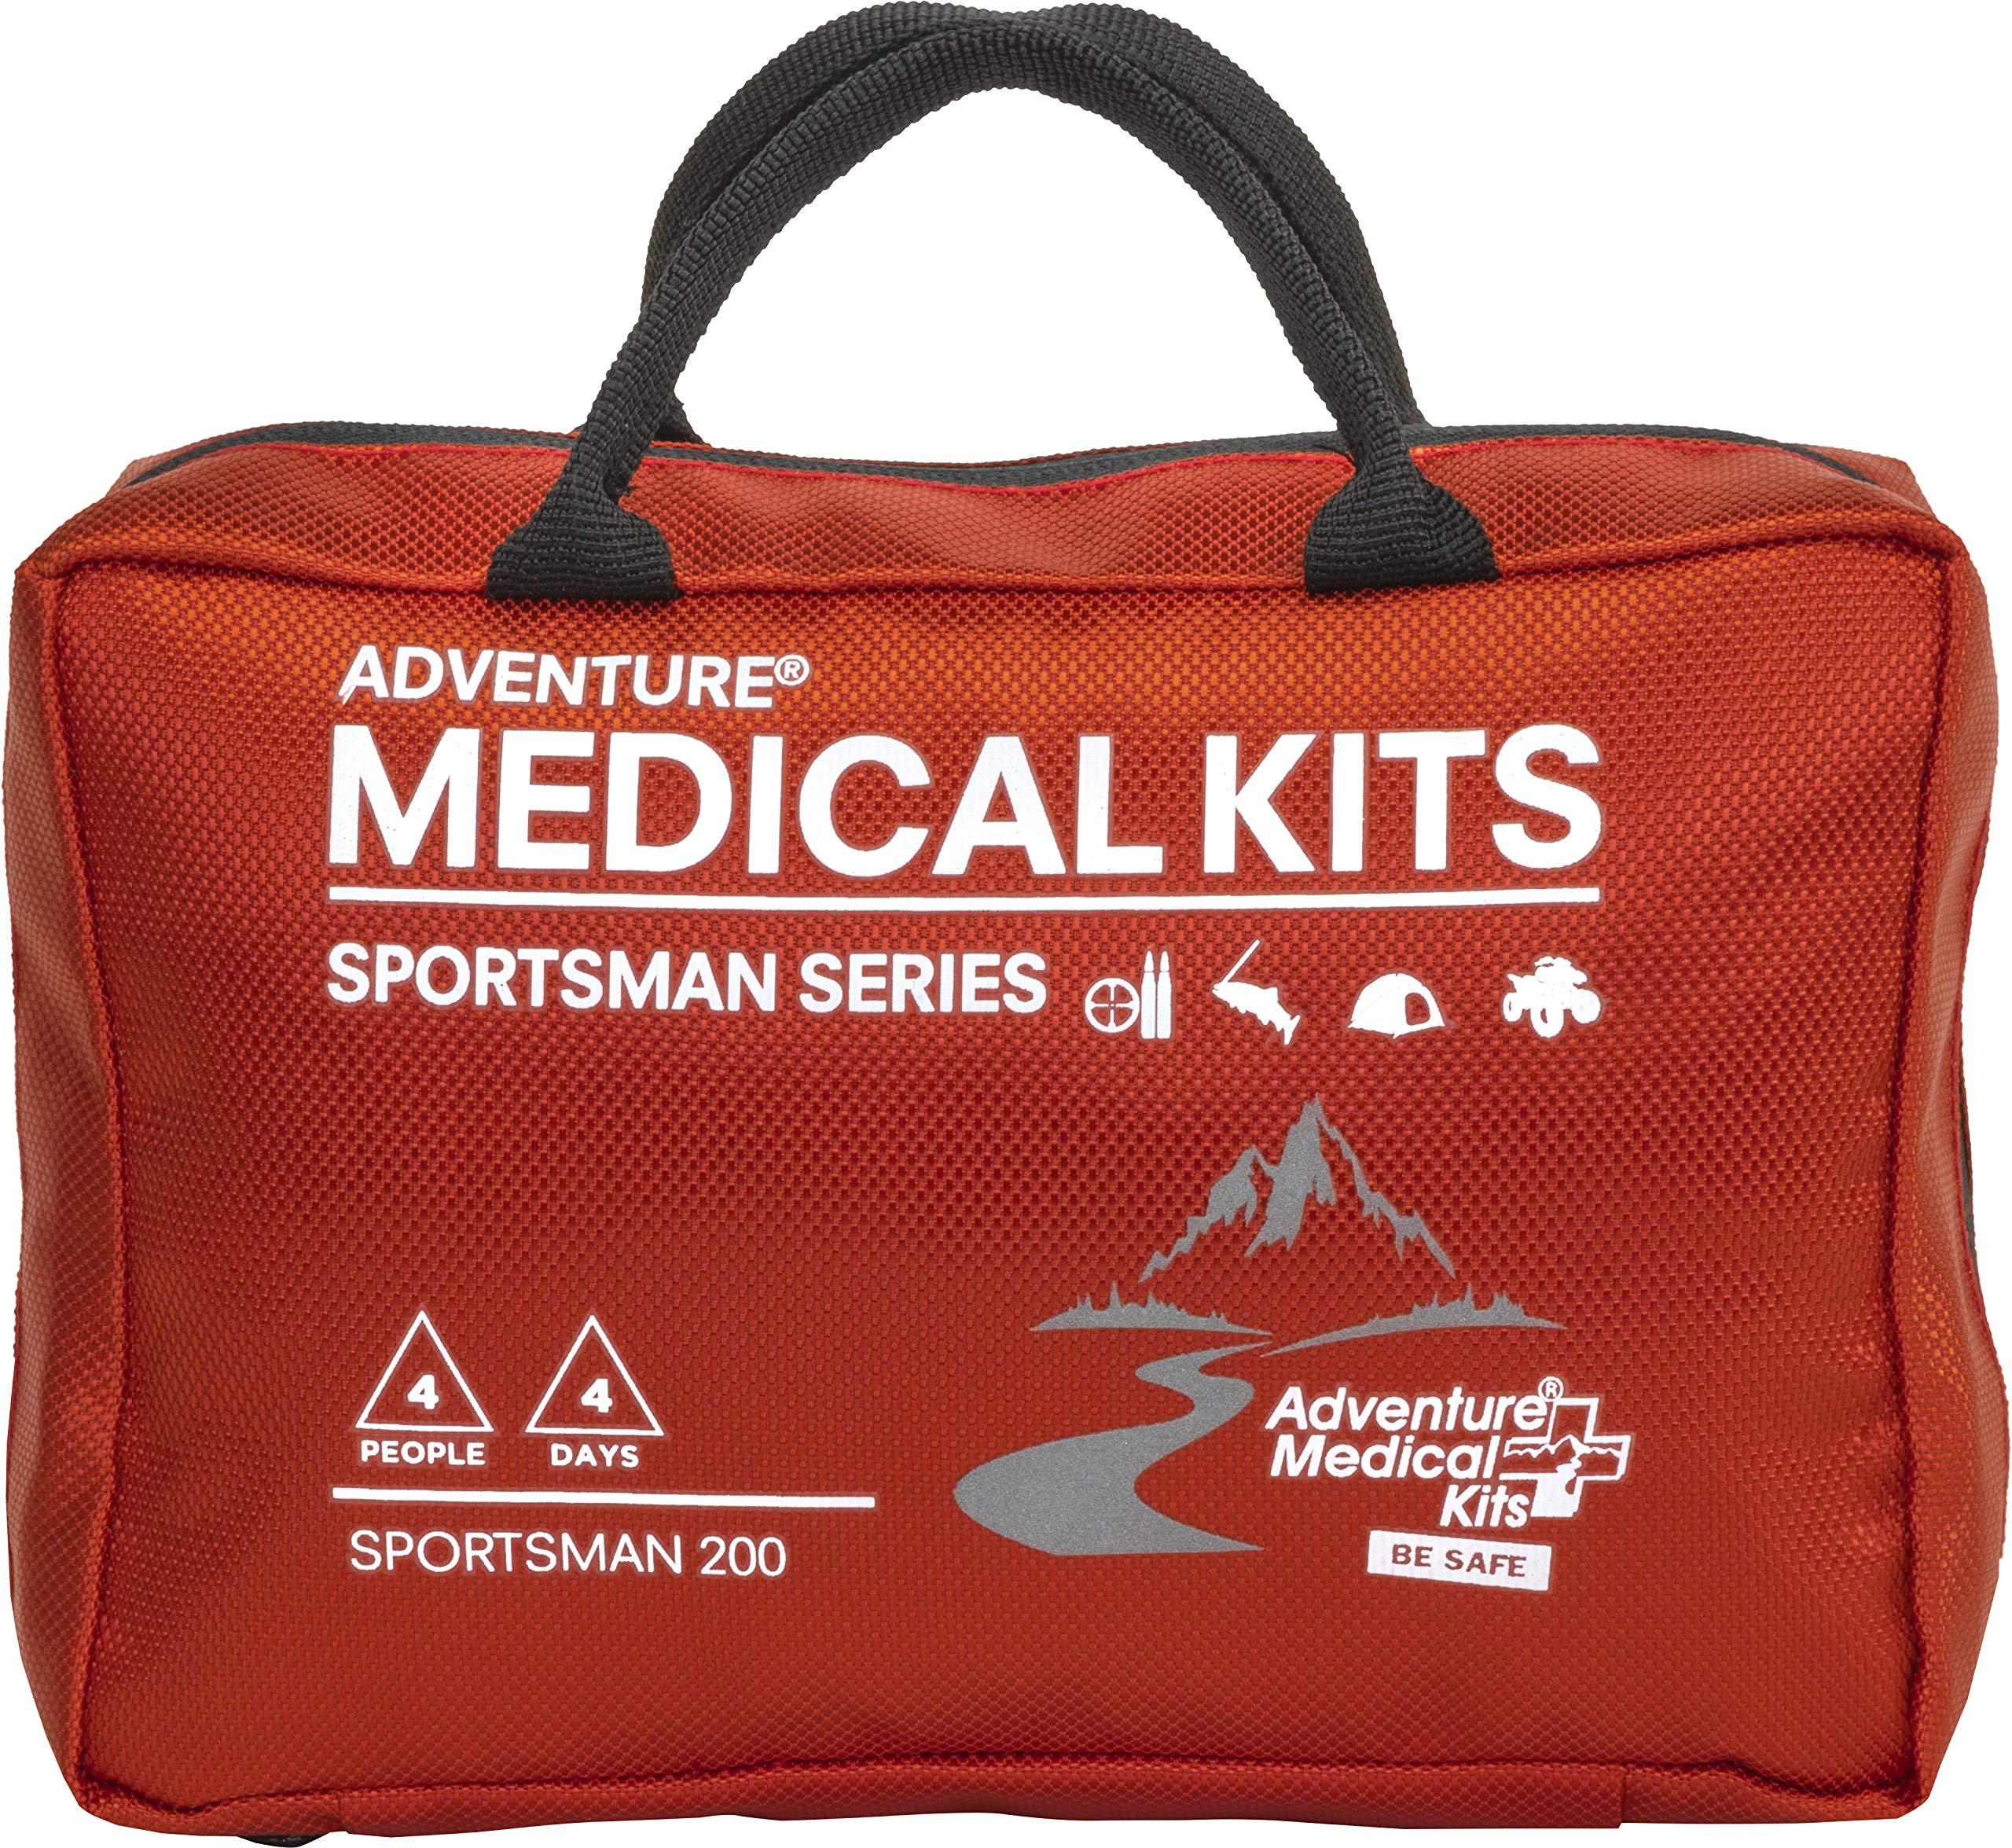 Adventure Medical Kits Sportsman Series 200 Outdoor First Aid Kit by Adventure Medical Kits